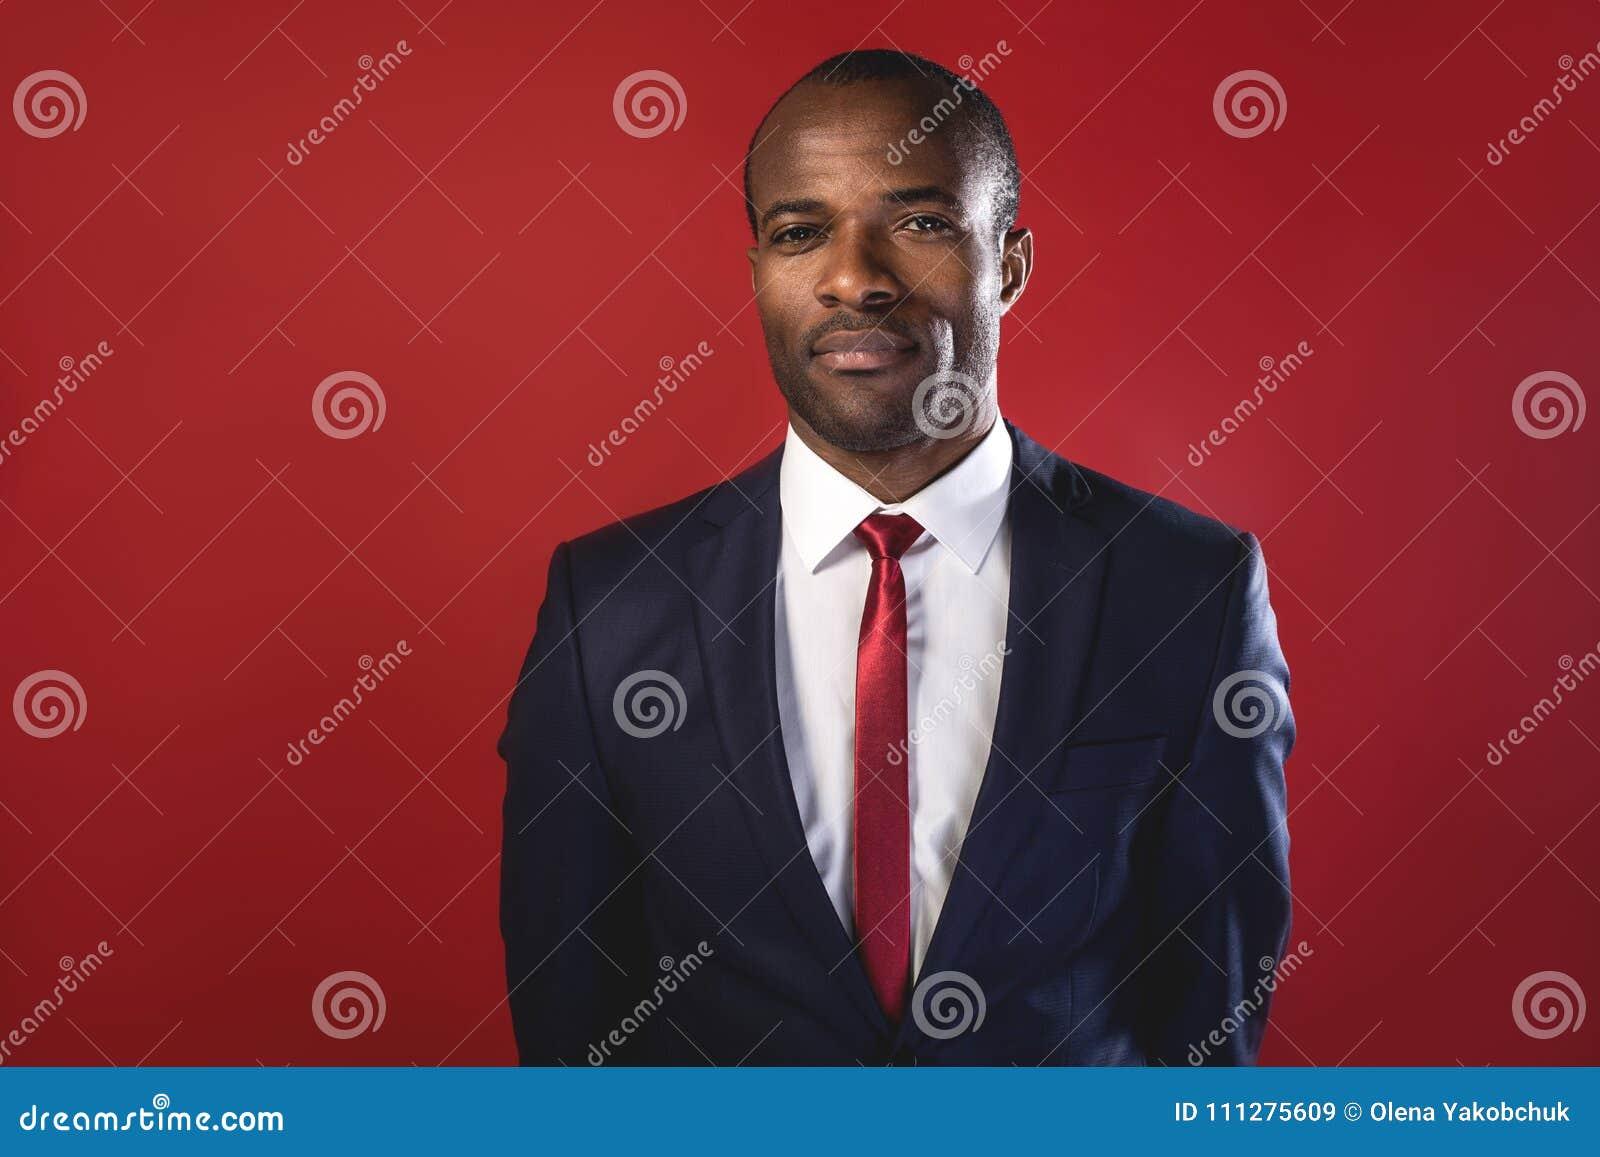 Elegant pleasant businessman is expressing confidence